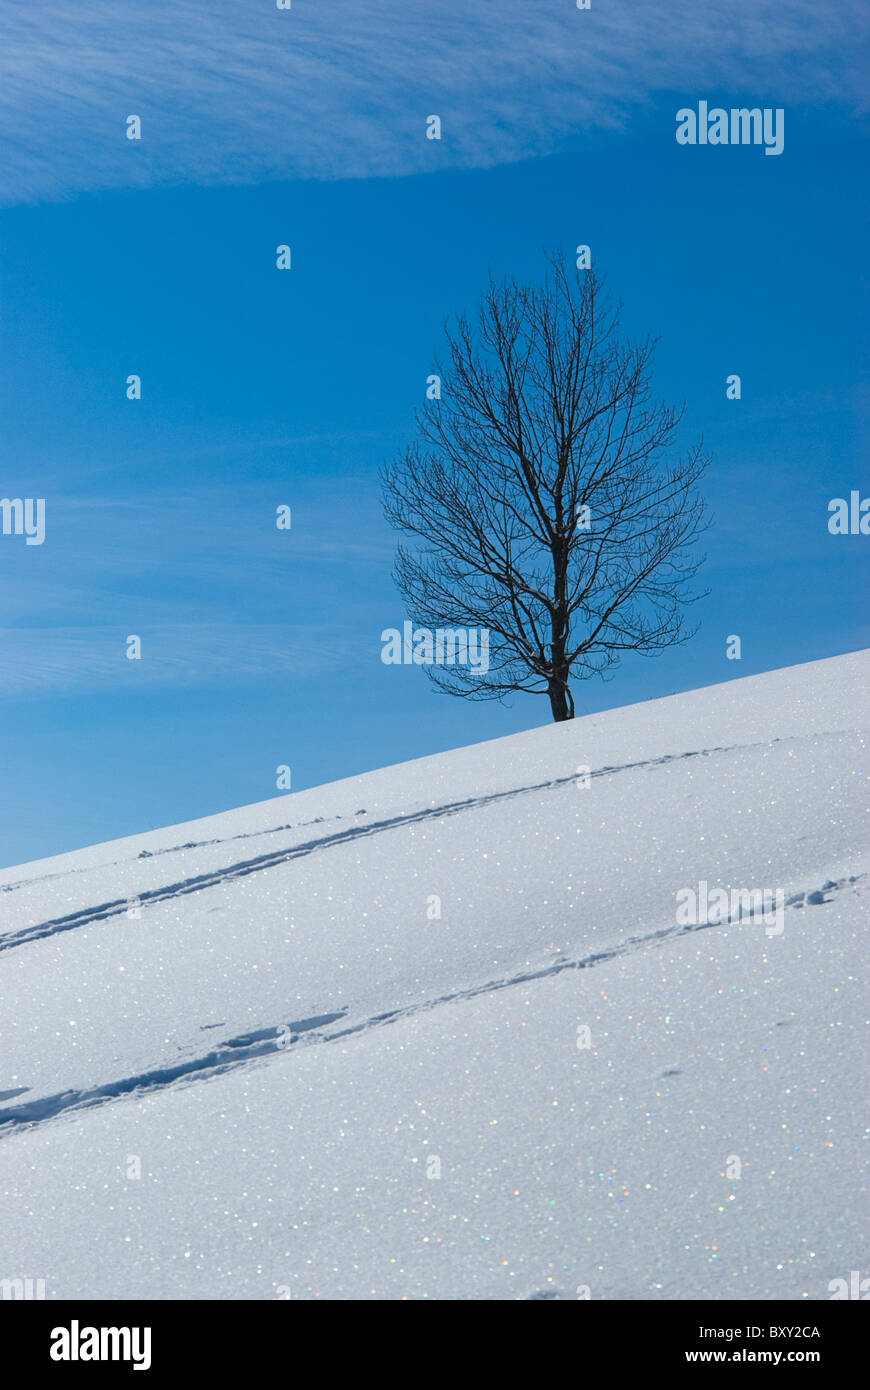 Winterlandschaft - Winter landscape - Stock Image